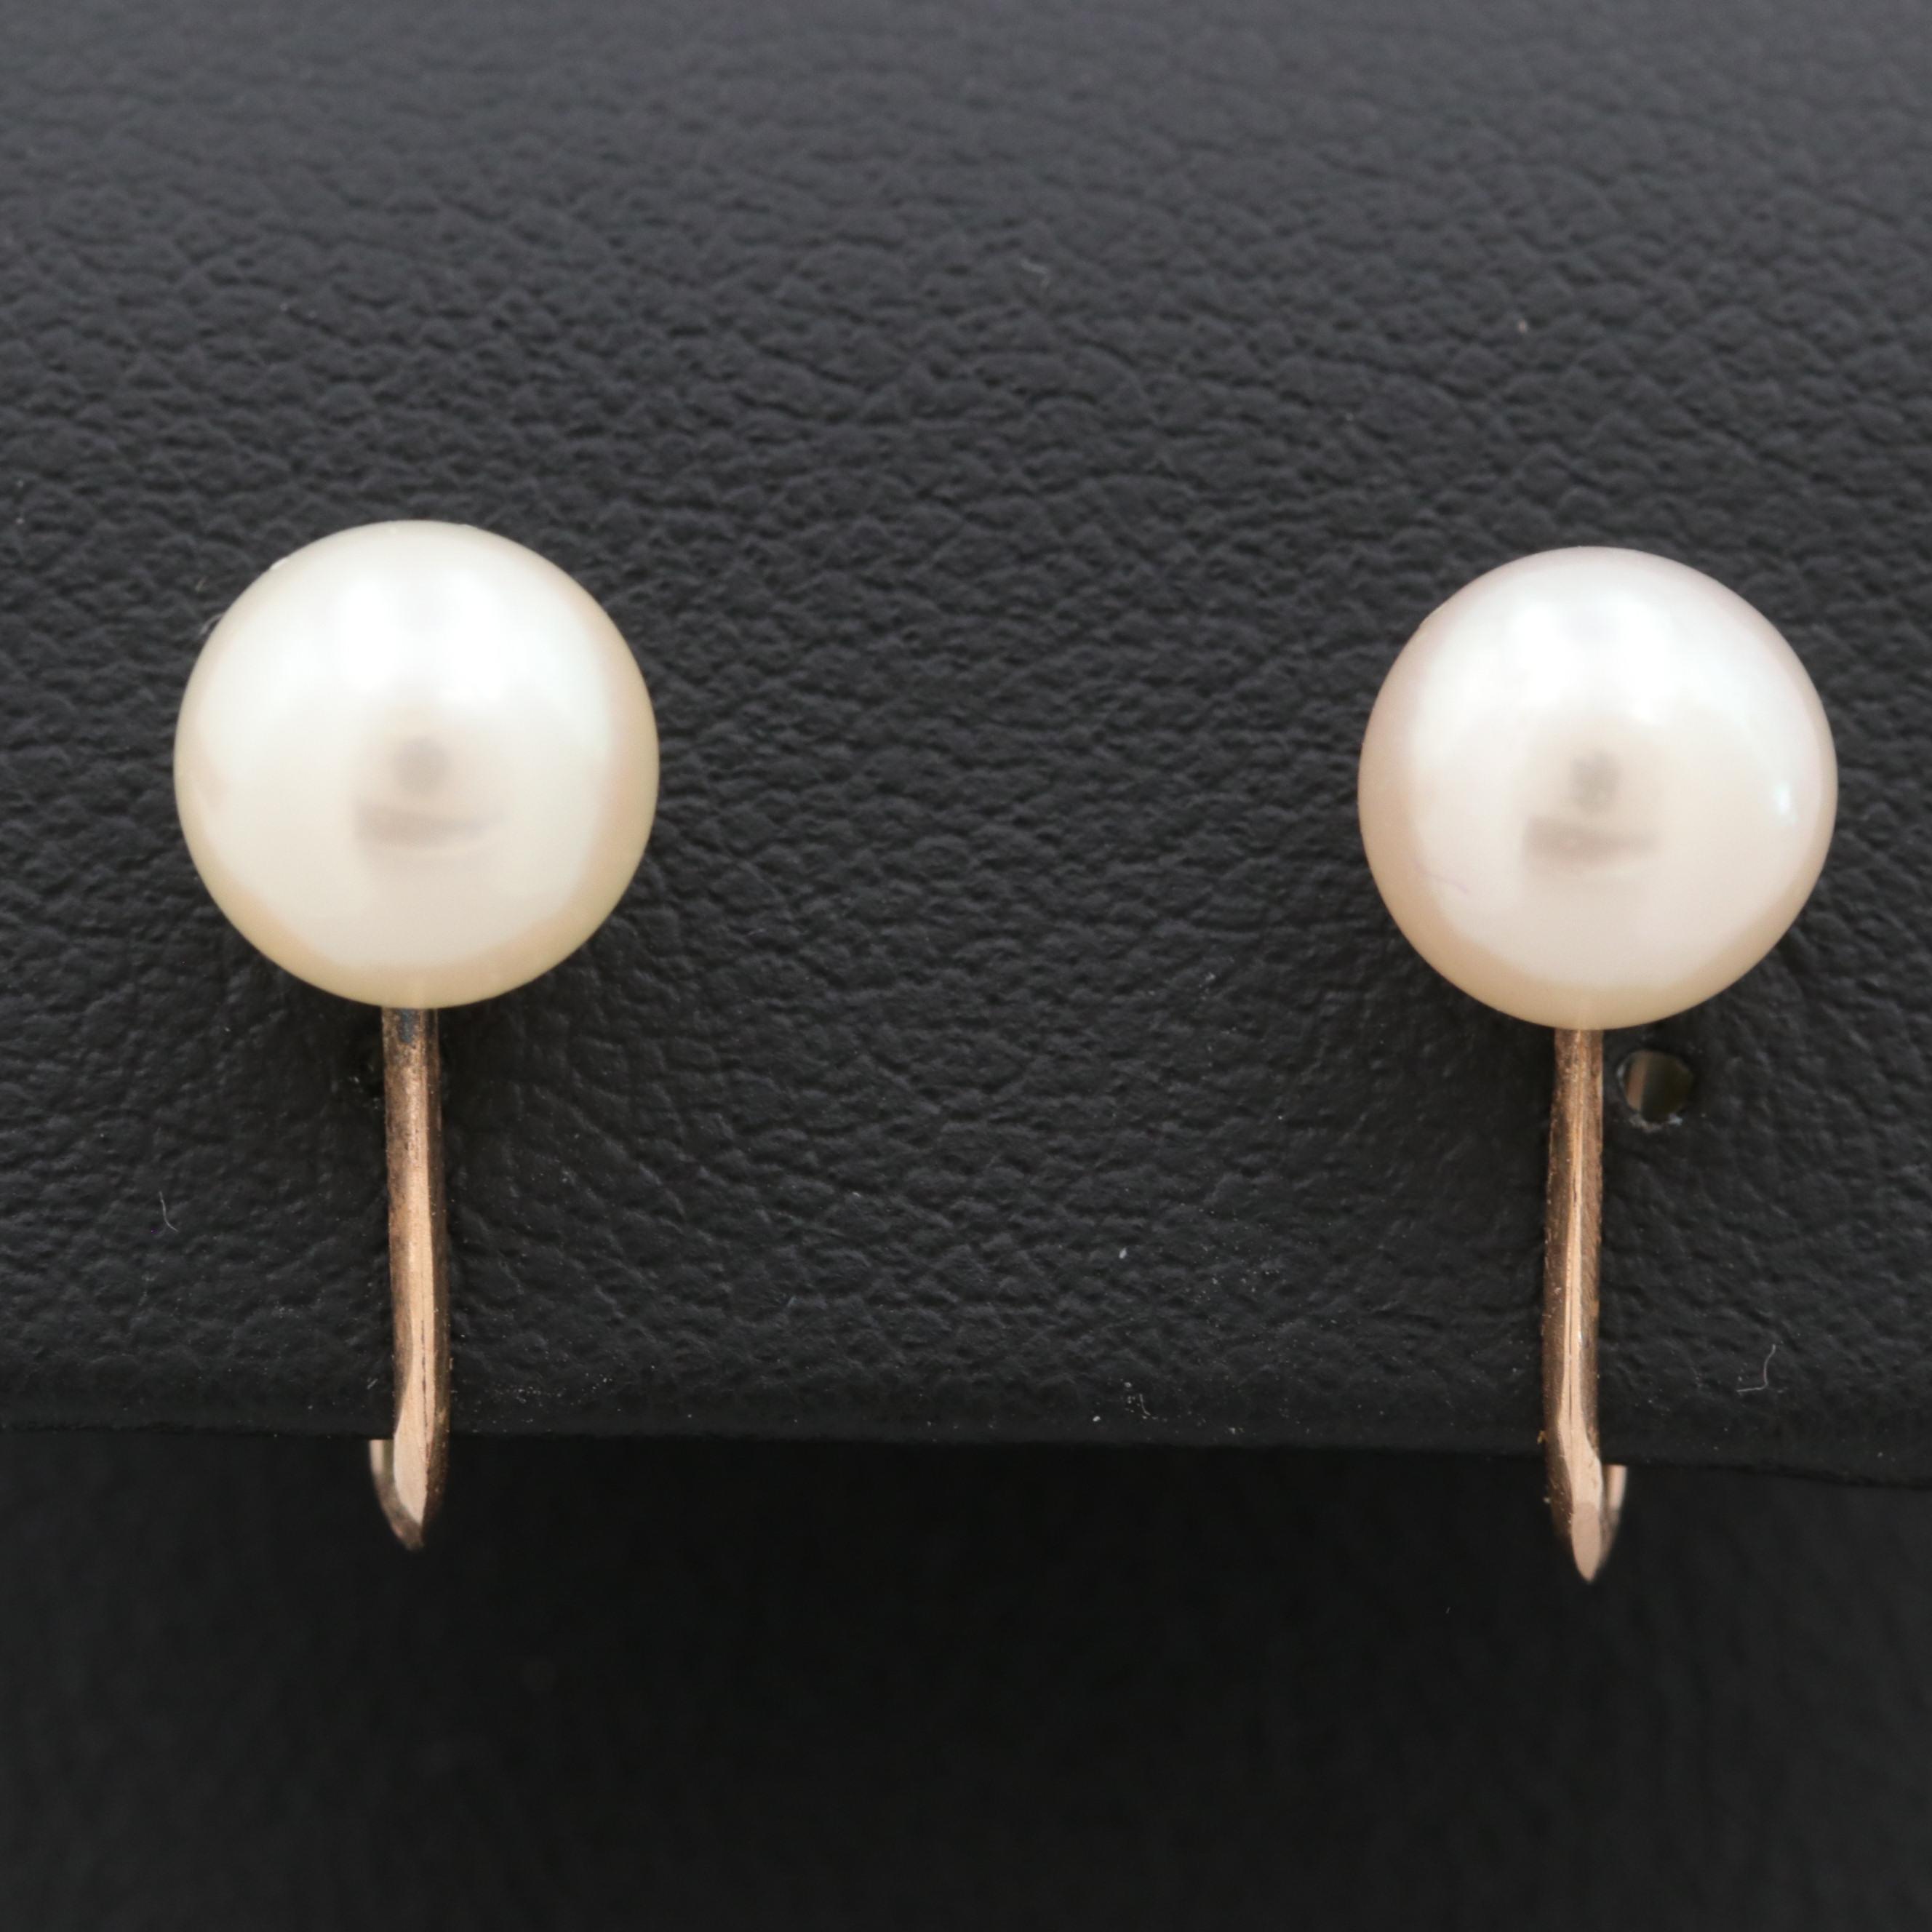 10K Yellow Gold Cultured Pearl Earrings